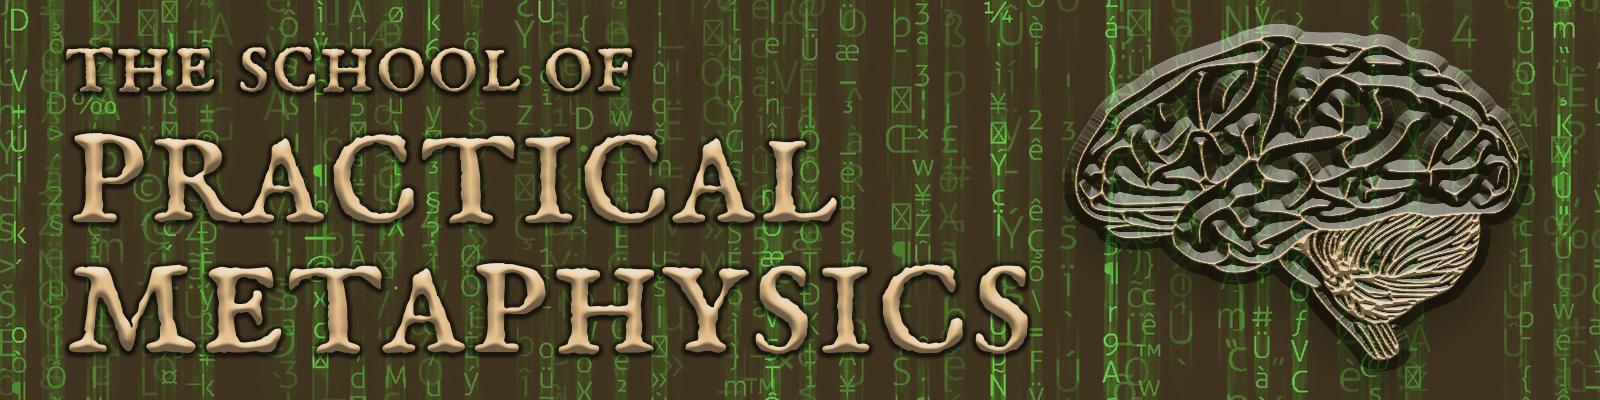 School of Metaphysics Banner MATRIX.jpg